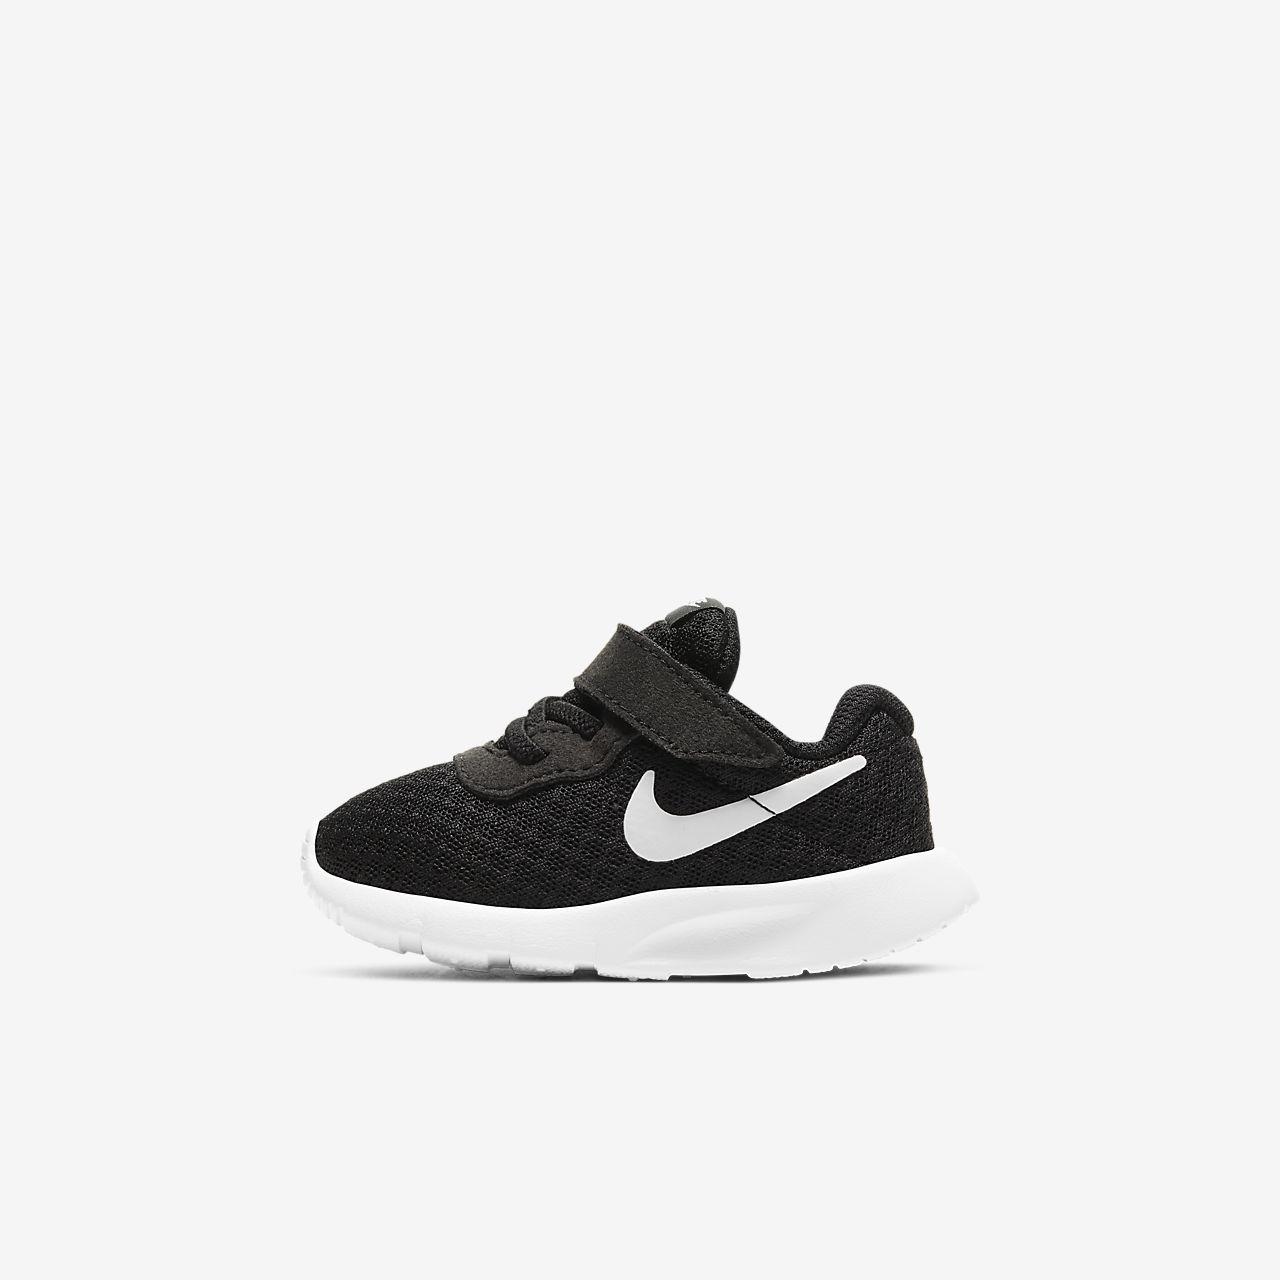 timeless design 7b549 ea12b ... Chaussure Nike Tanjun pour Bébé Petit enfant (17-27)